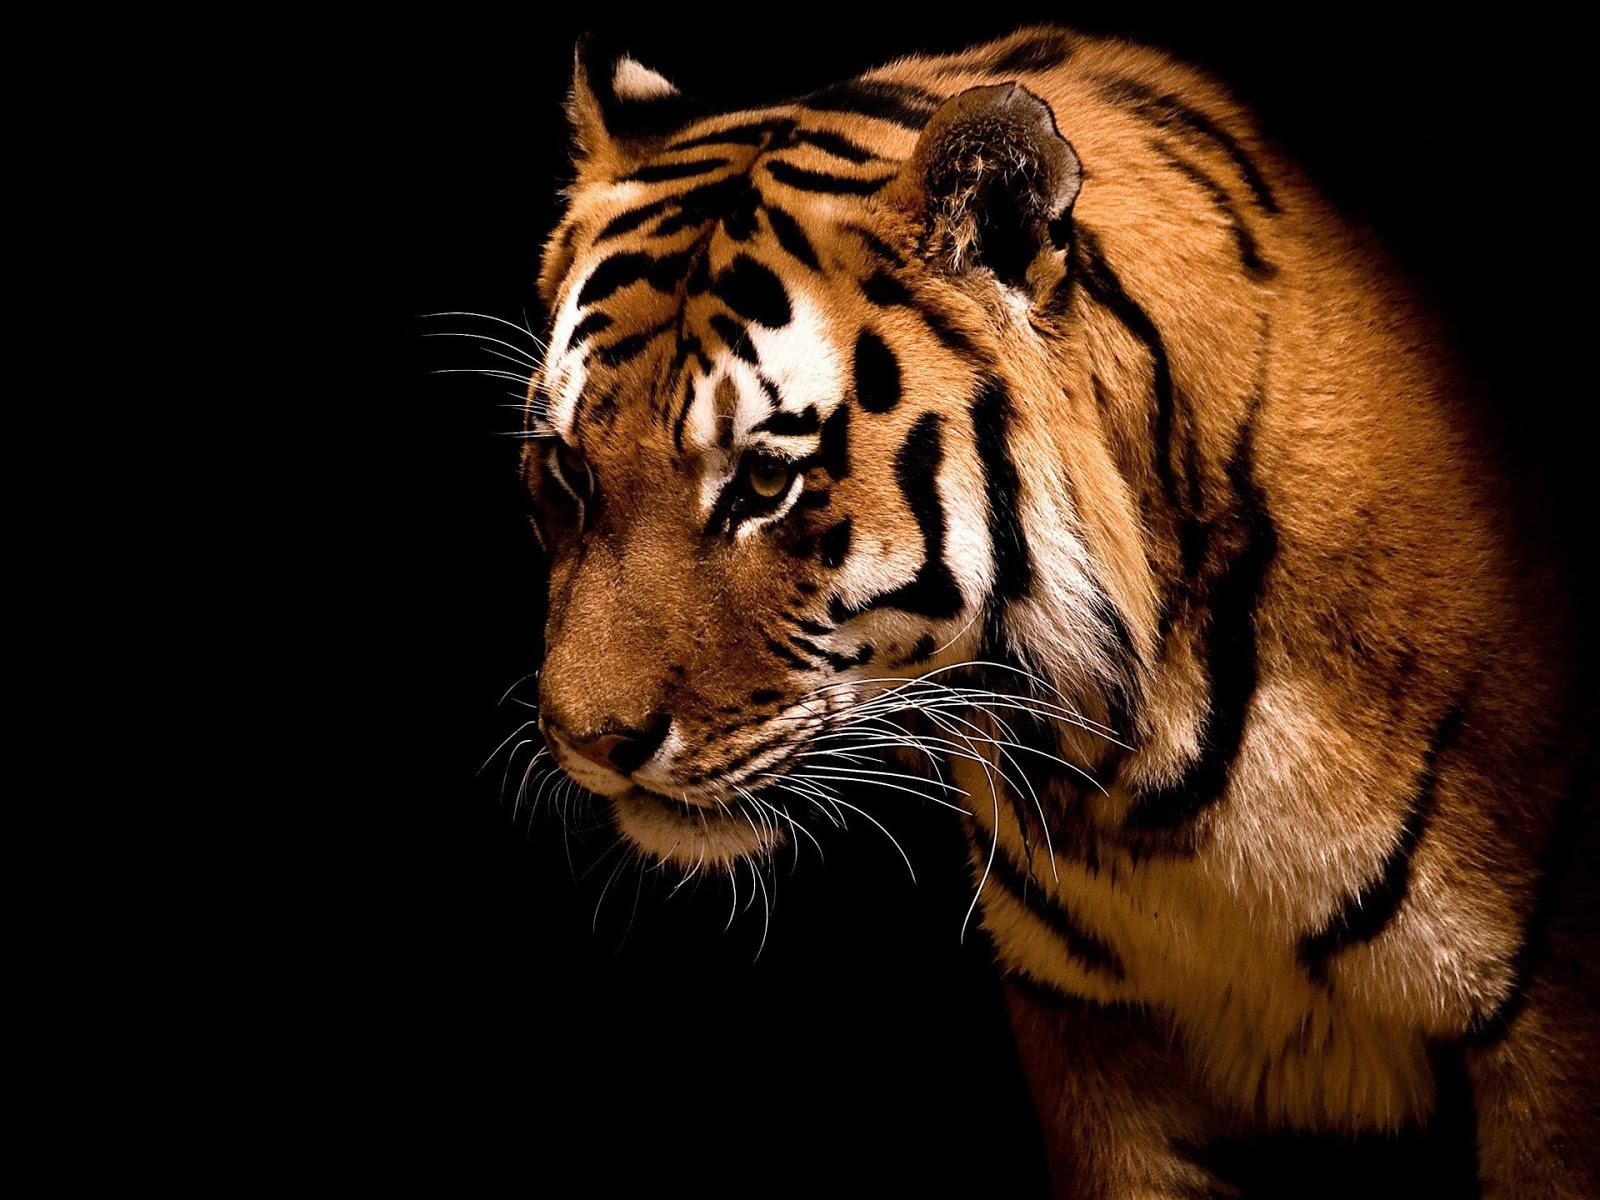 Wallpaper Bengal Tiger Hd Animals 10217: Background Wedding Pics: Background Tiger